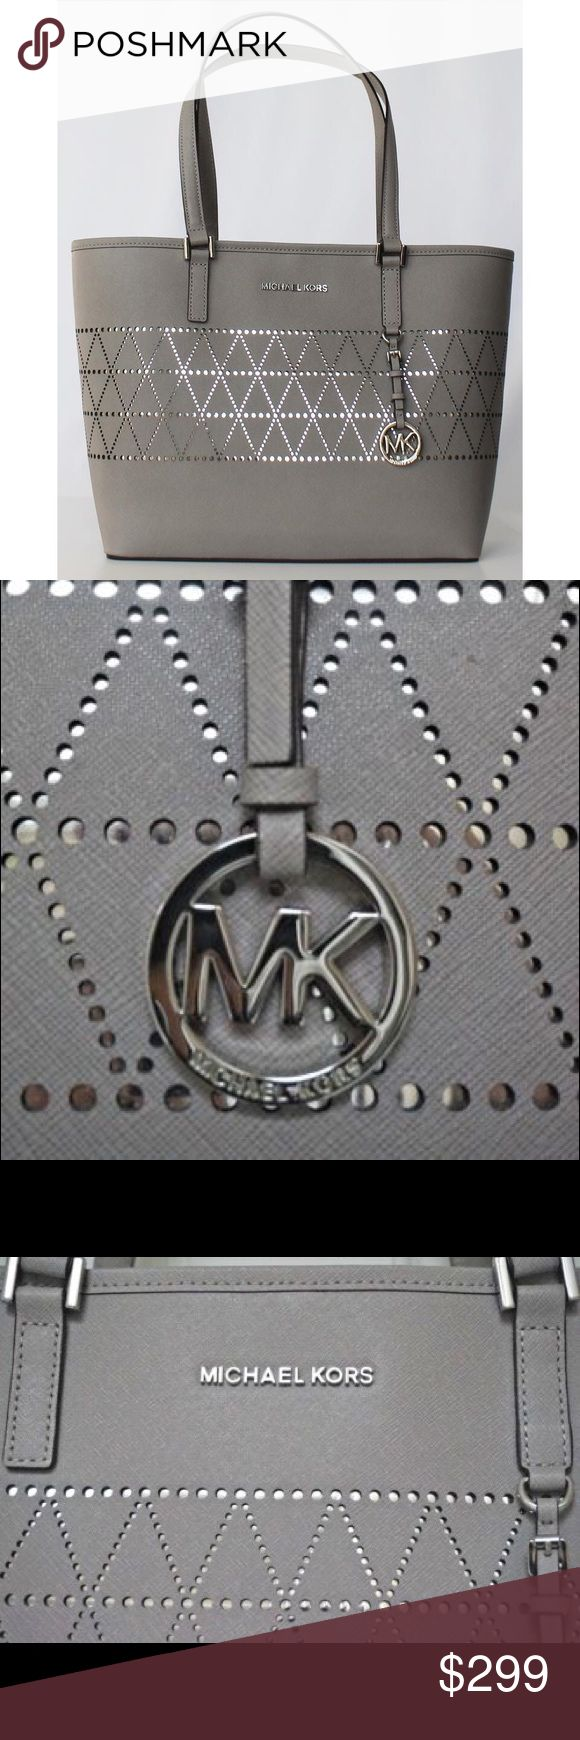 "Michael Kors Leather Tote Handbag Pearl Grey Size : Medium Color : Gray Features : Stain-Resistant, Clasp, Key Clip, Open, Handbag Pattern : Geometric, Diamond Bag Height : 10.5"" Strap Drop : 11in. Material : Leather Bag Length : Top15"" - Bottom 12.5"" Bag Depth : 4.5"" Michael Kors Bags"